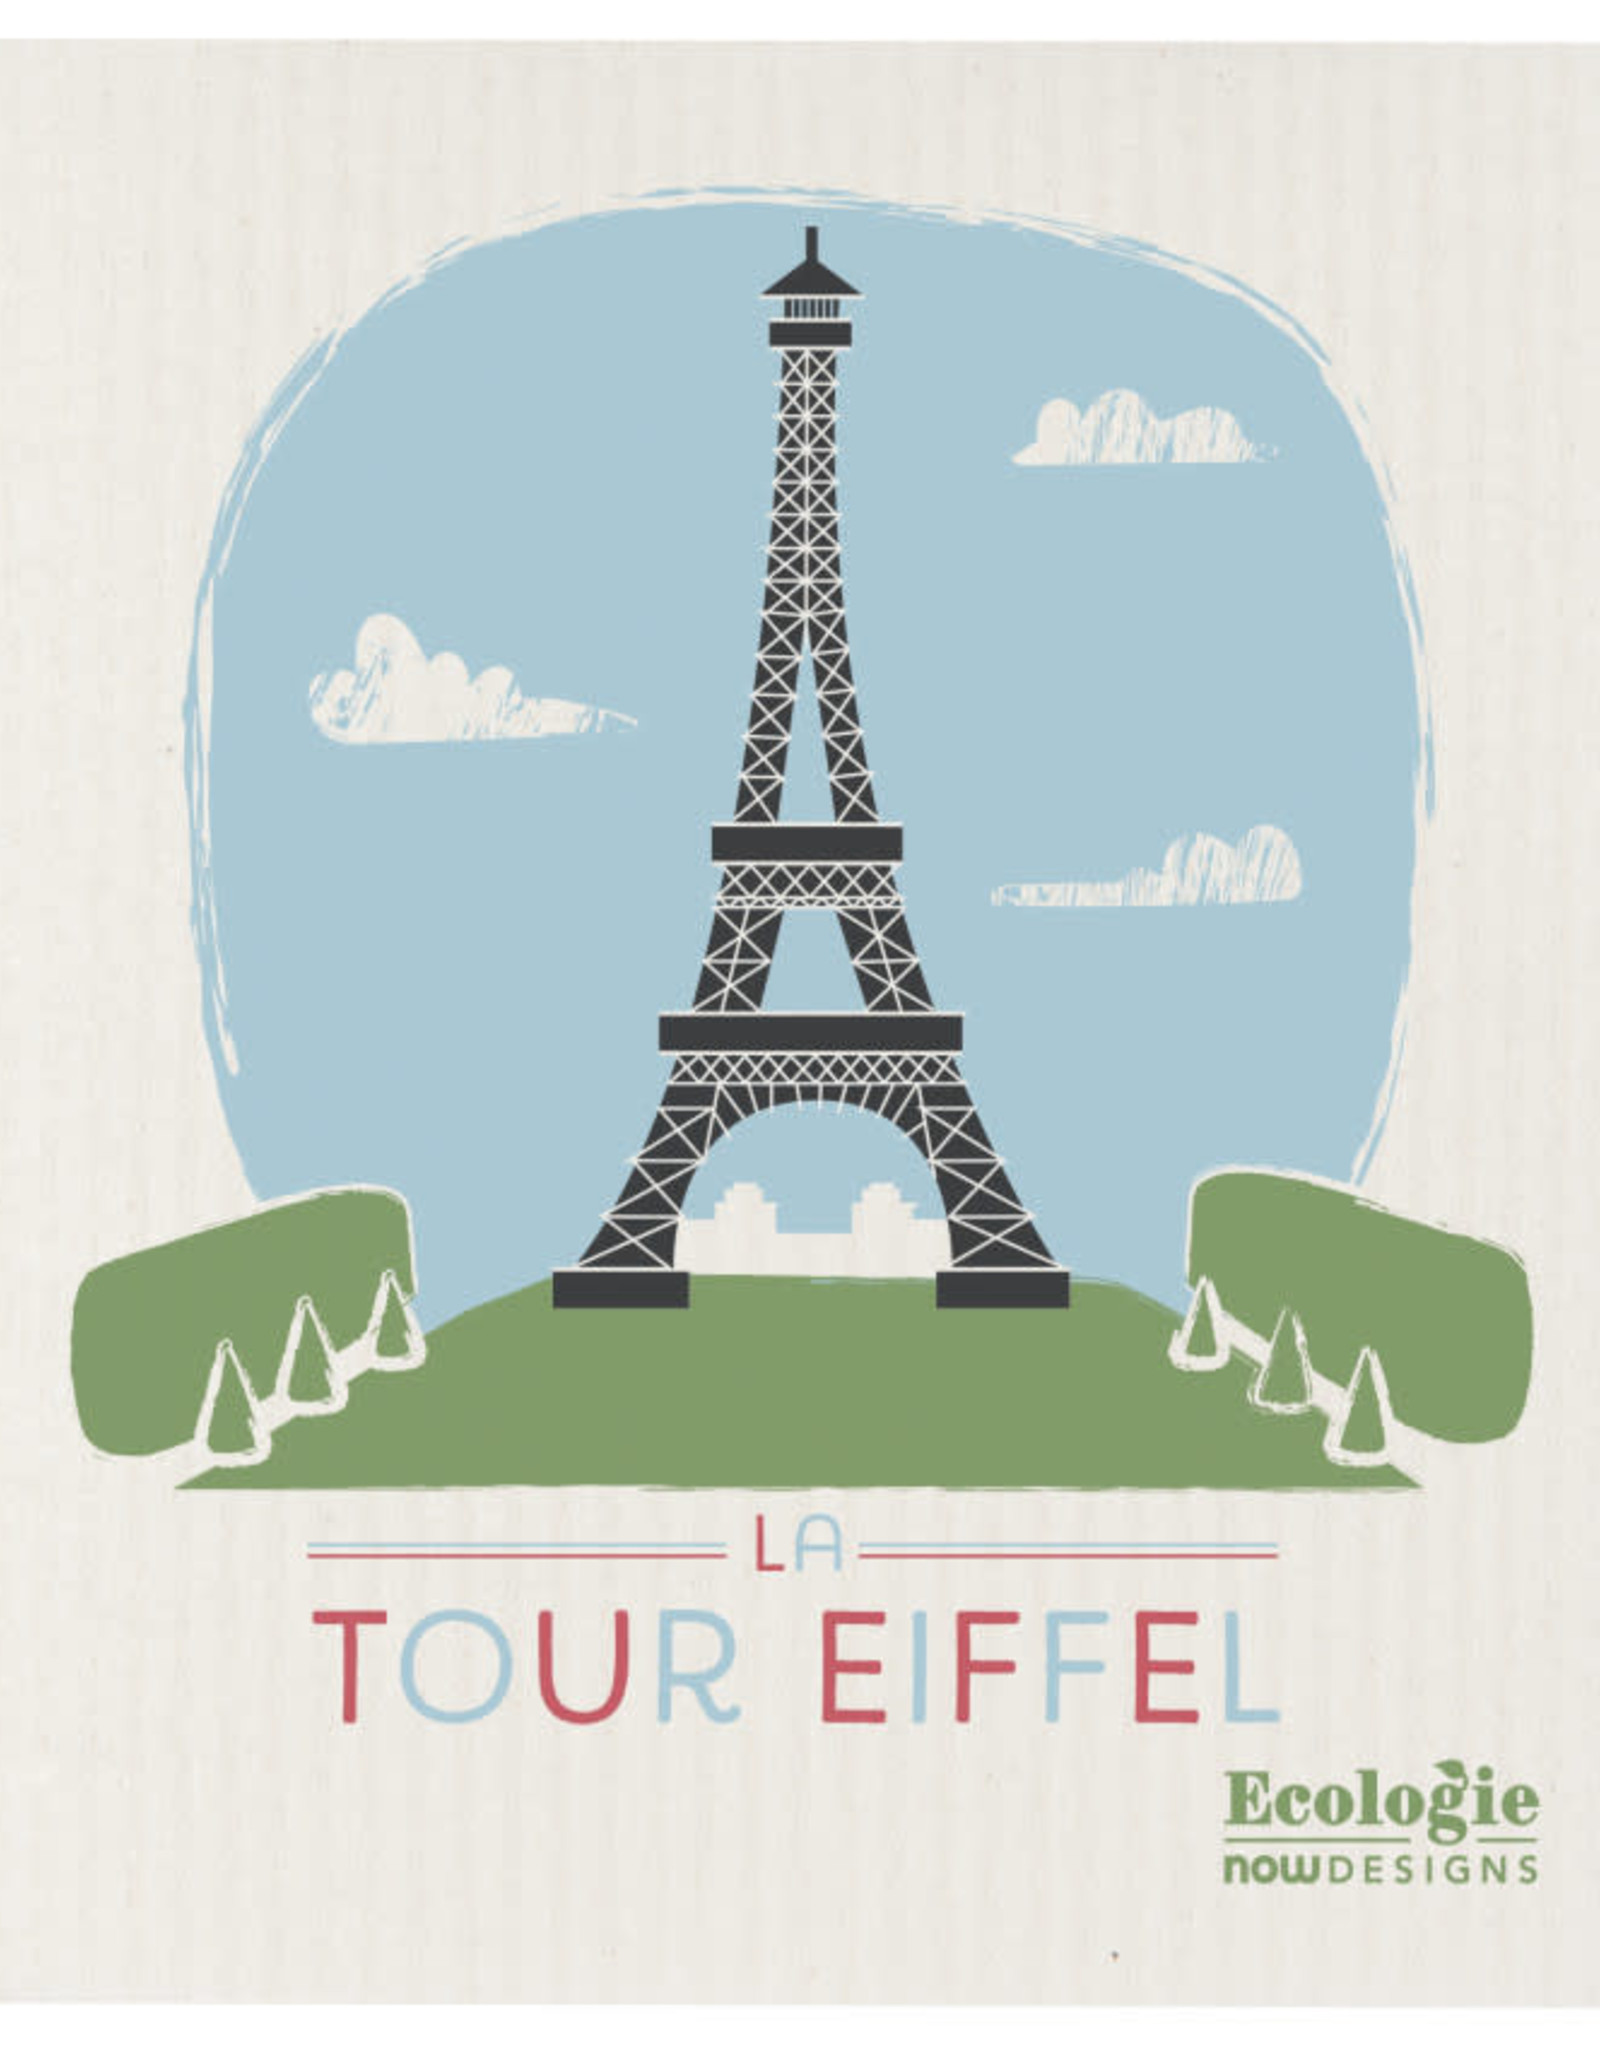 Now Designs Swedish Dishcloth La Tour Eiffel Ecologie